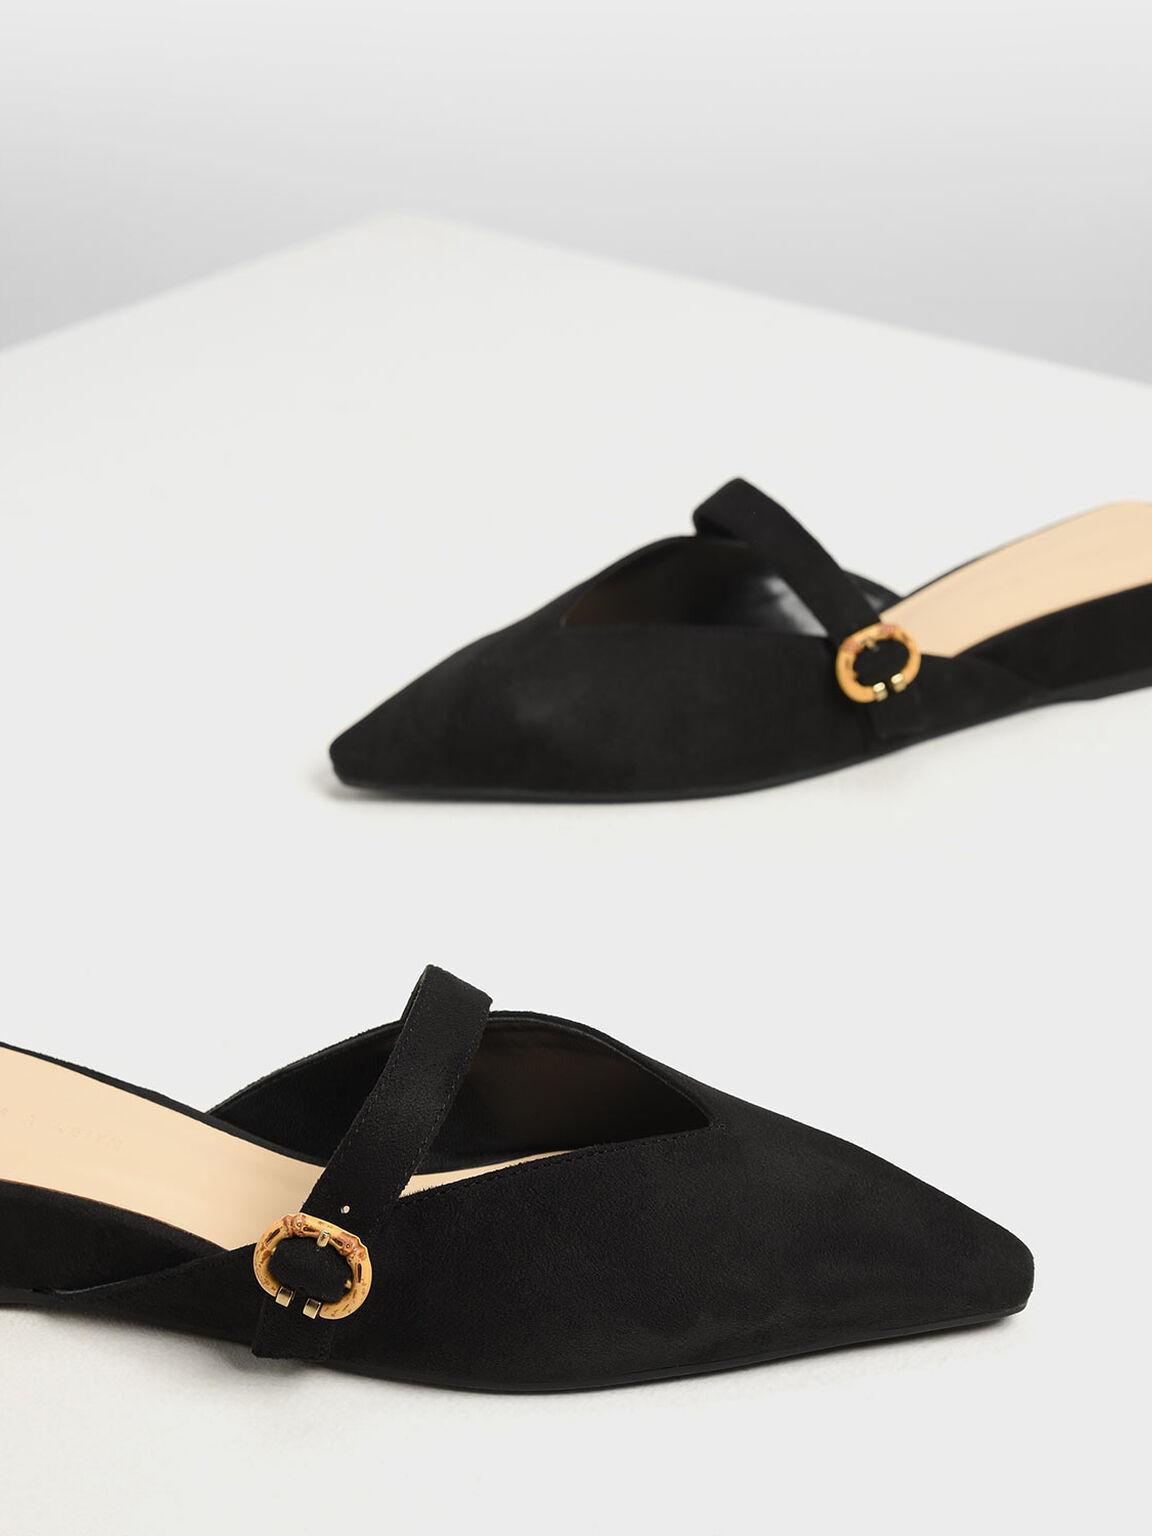 V-Cut Low Wedge Mules, Black Textured, hi-res